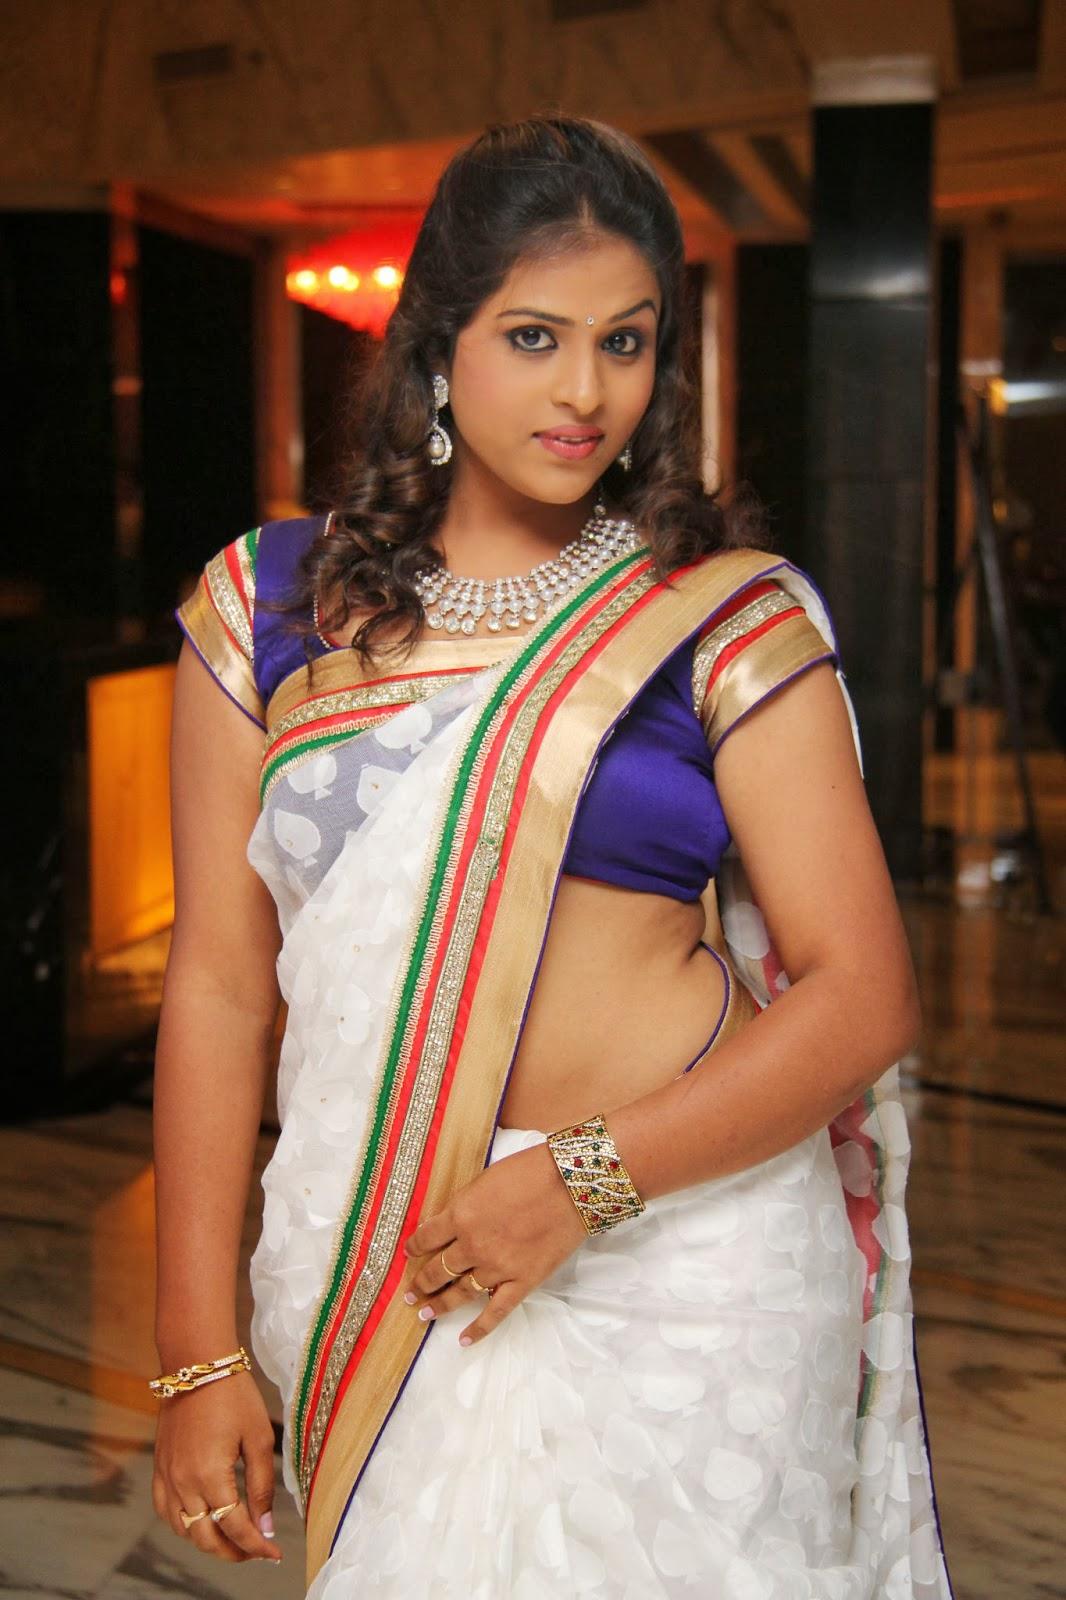 Voluptuous sexy Hemalatha hot photos in white saree at birthday party